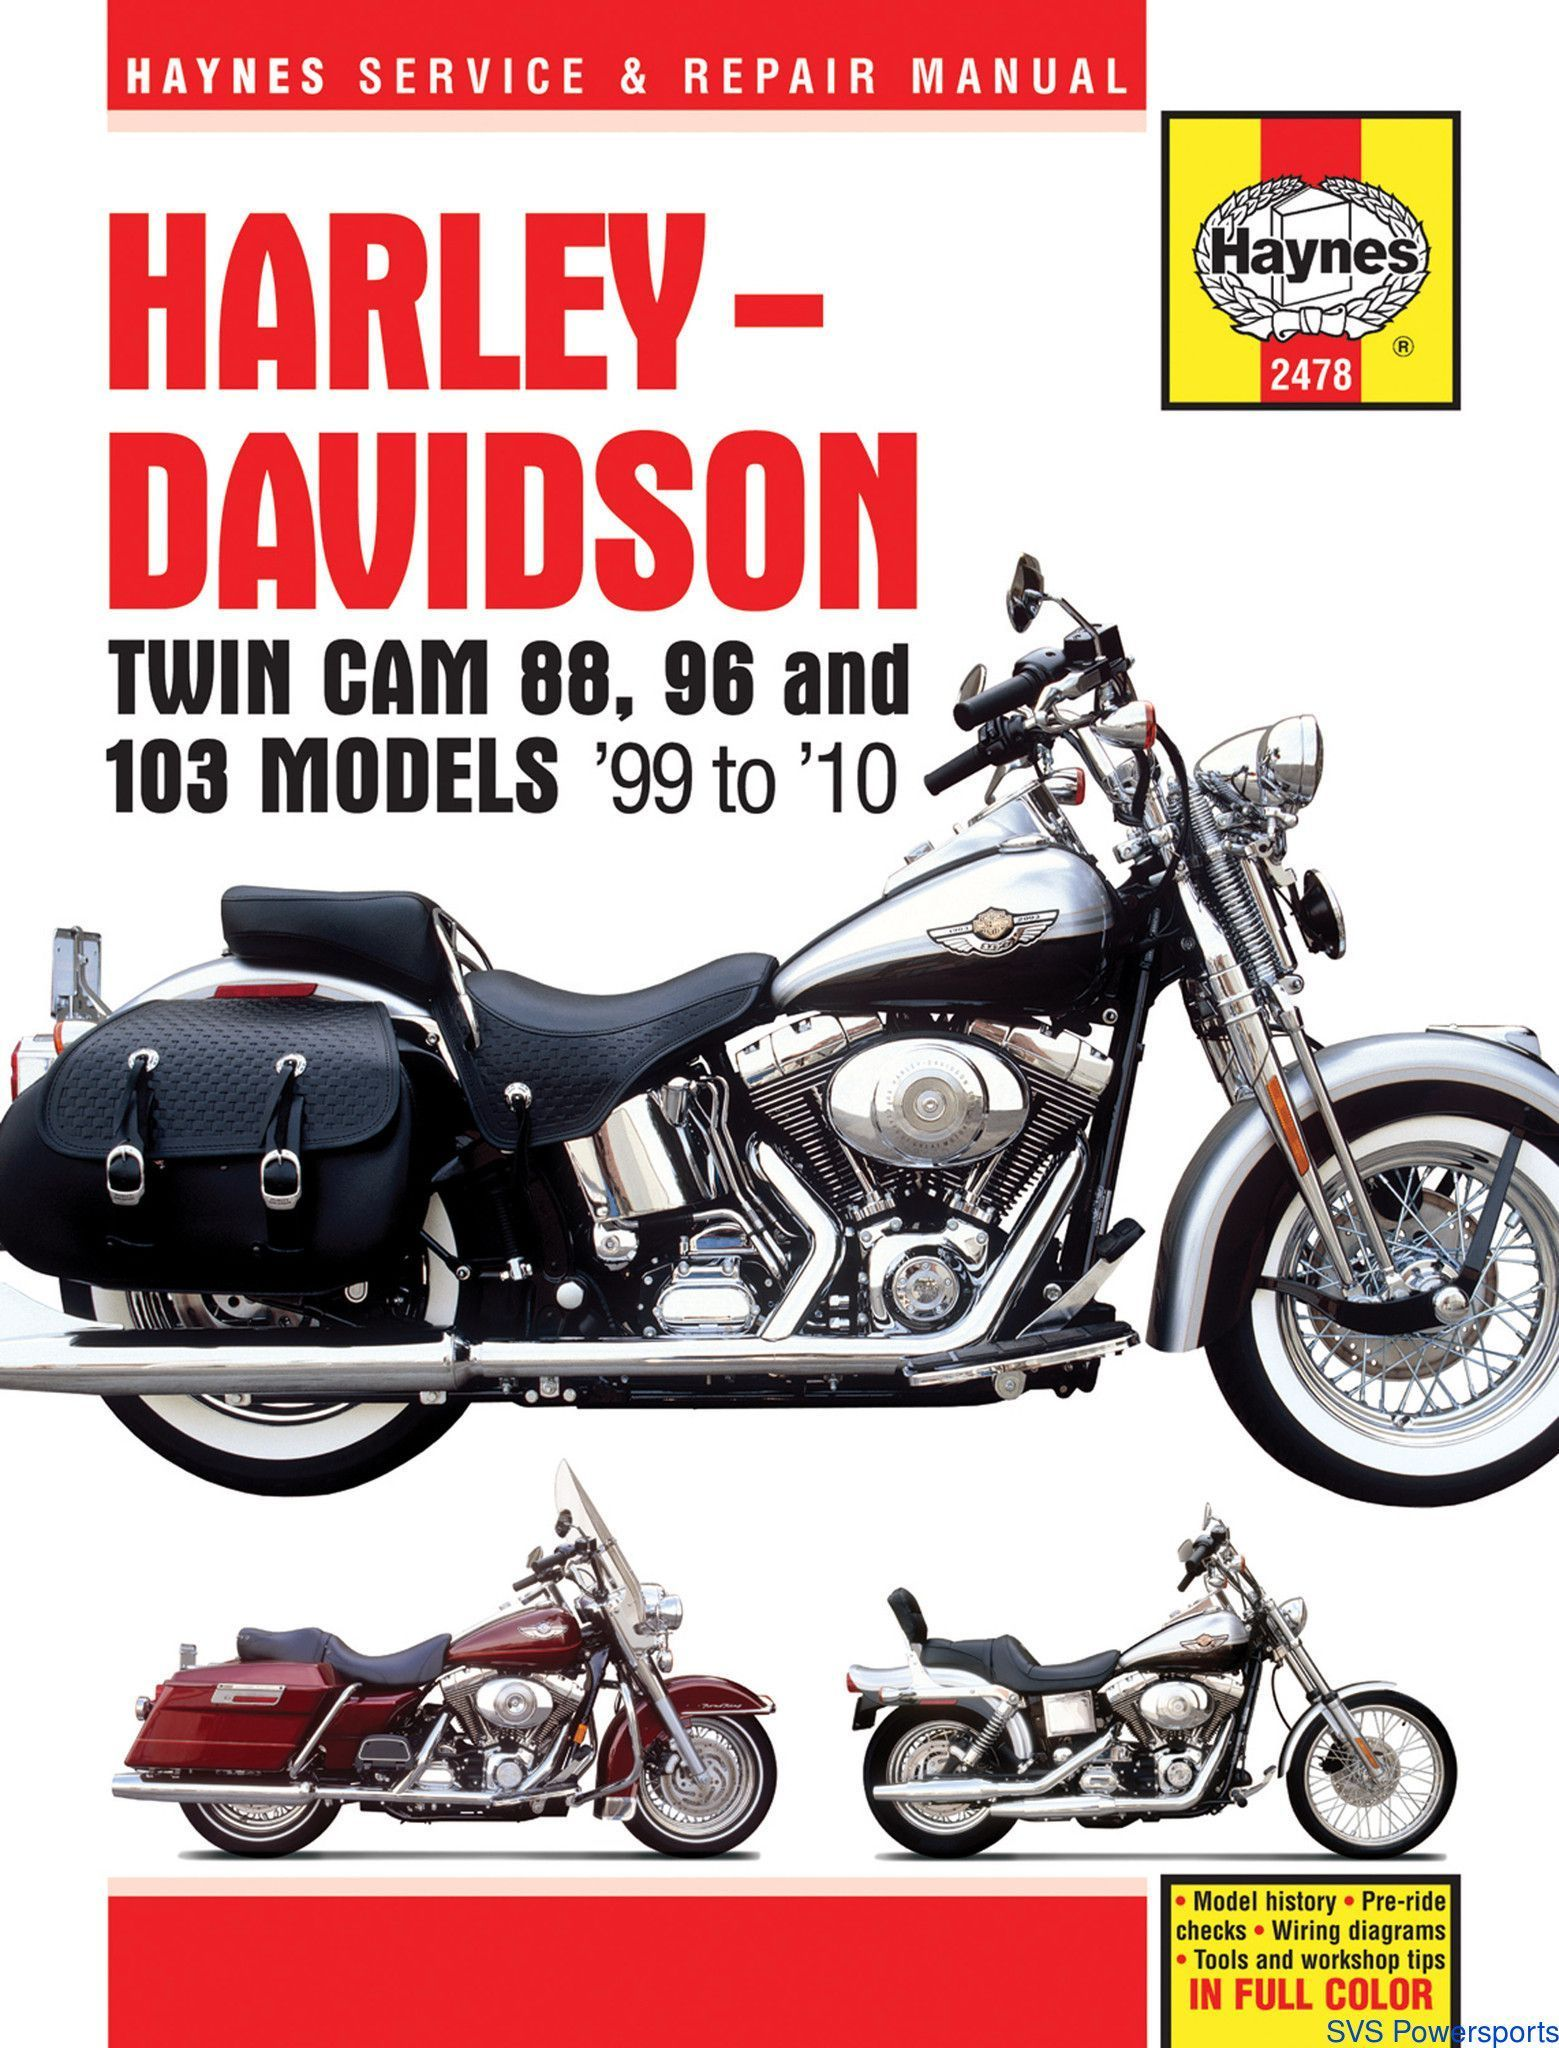 Haynes M2478 Repair Manual for Harley-Davidson Twin Cam 88 / Dyna Glide /  Electr